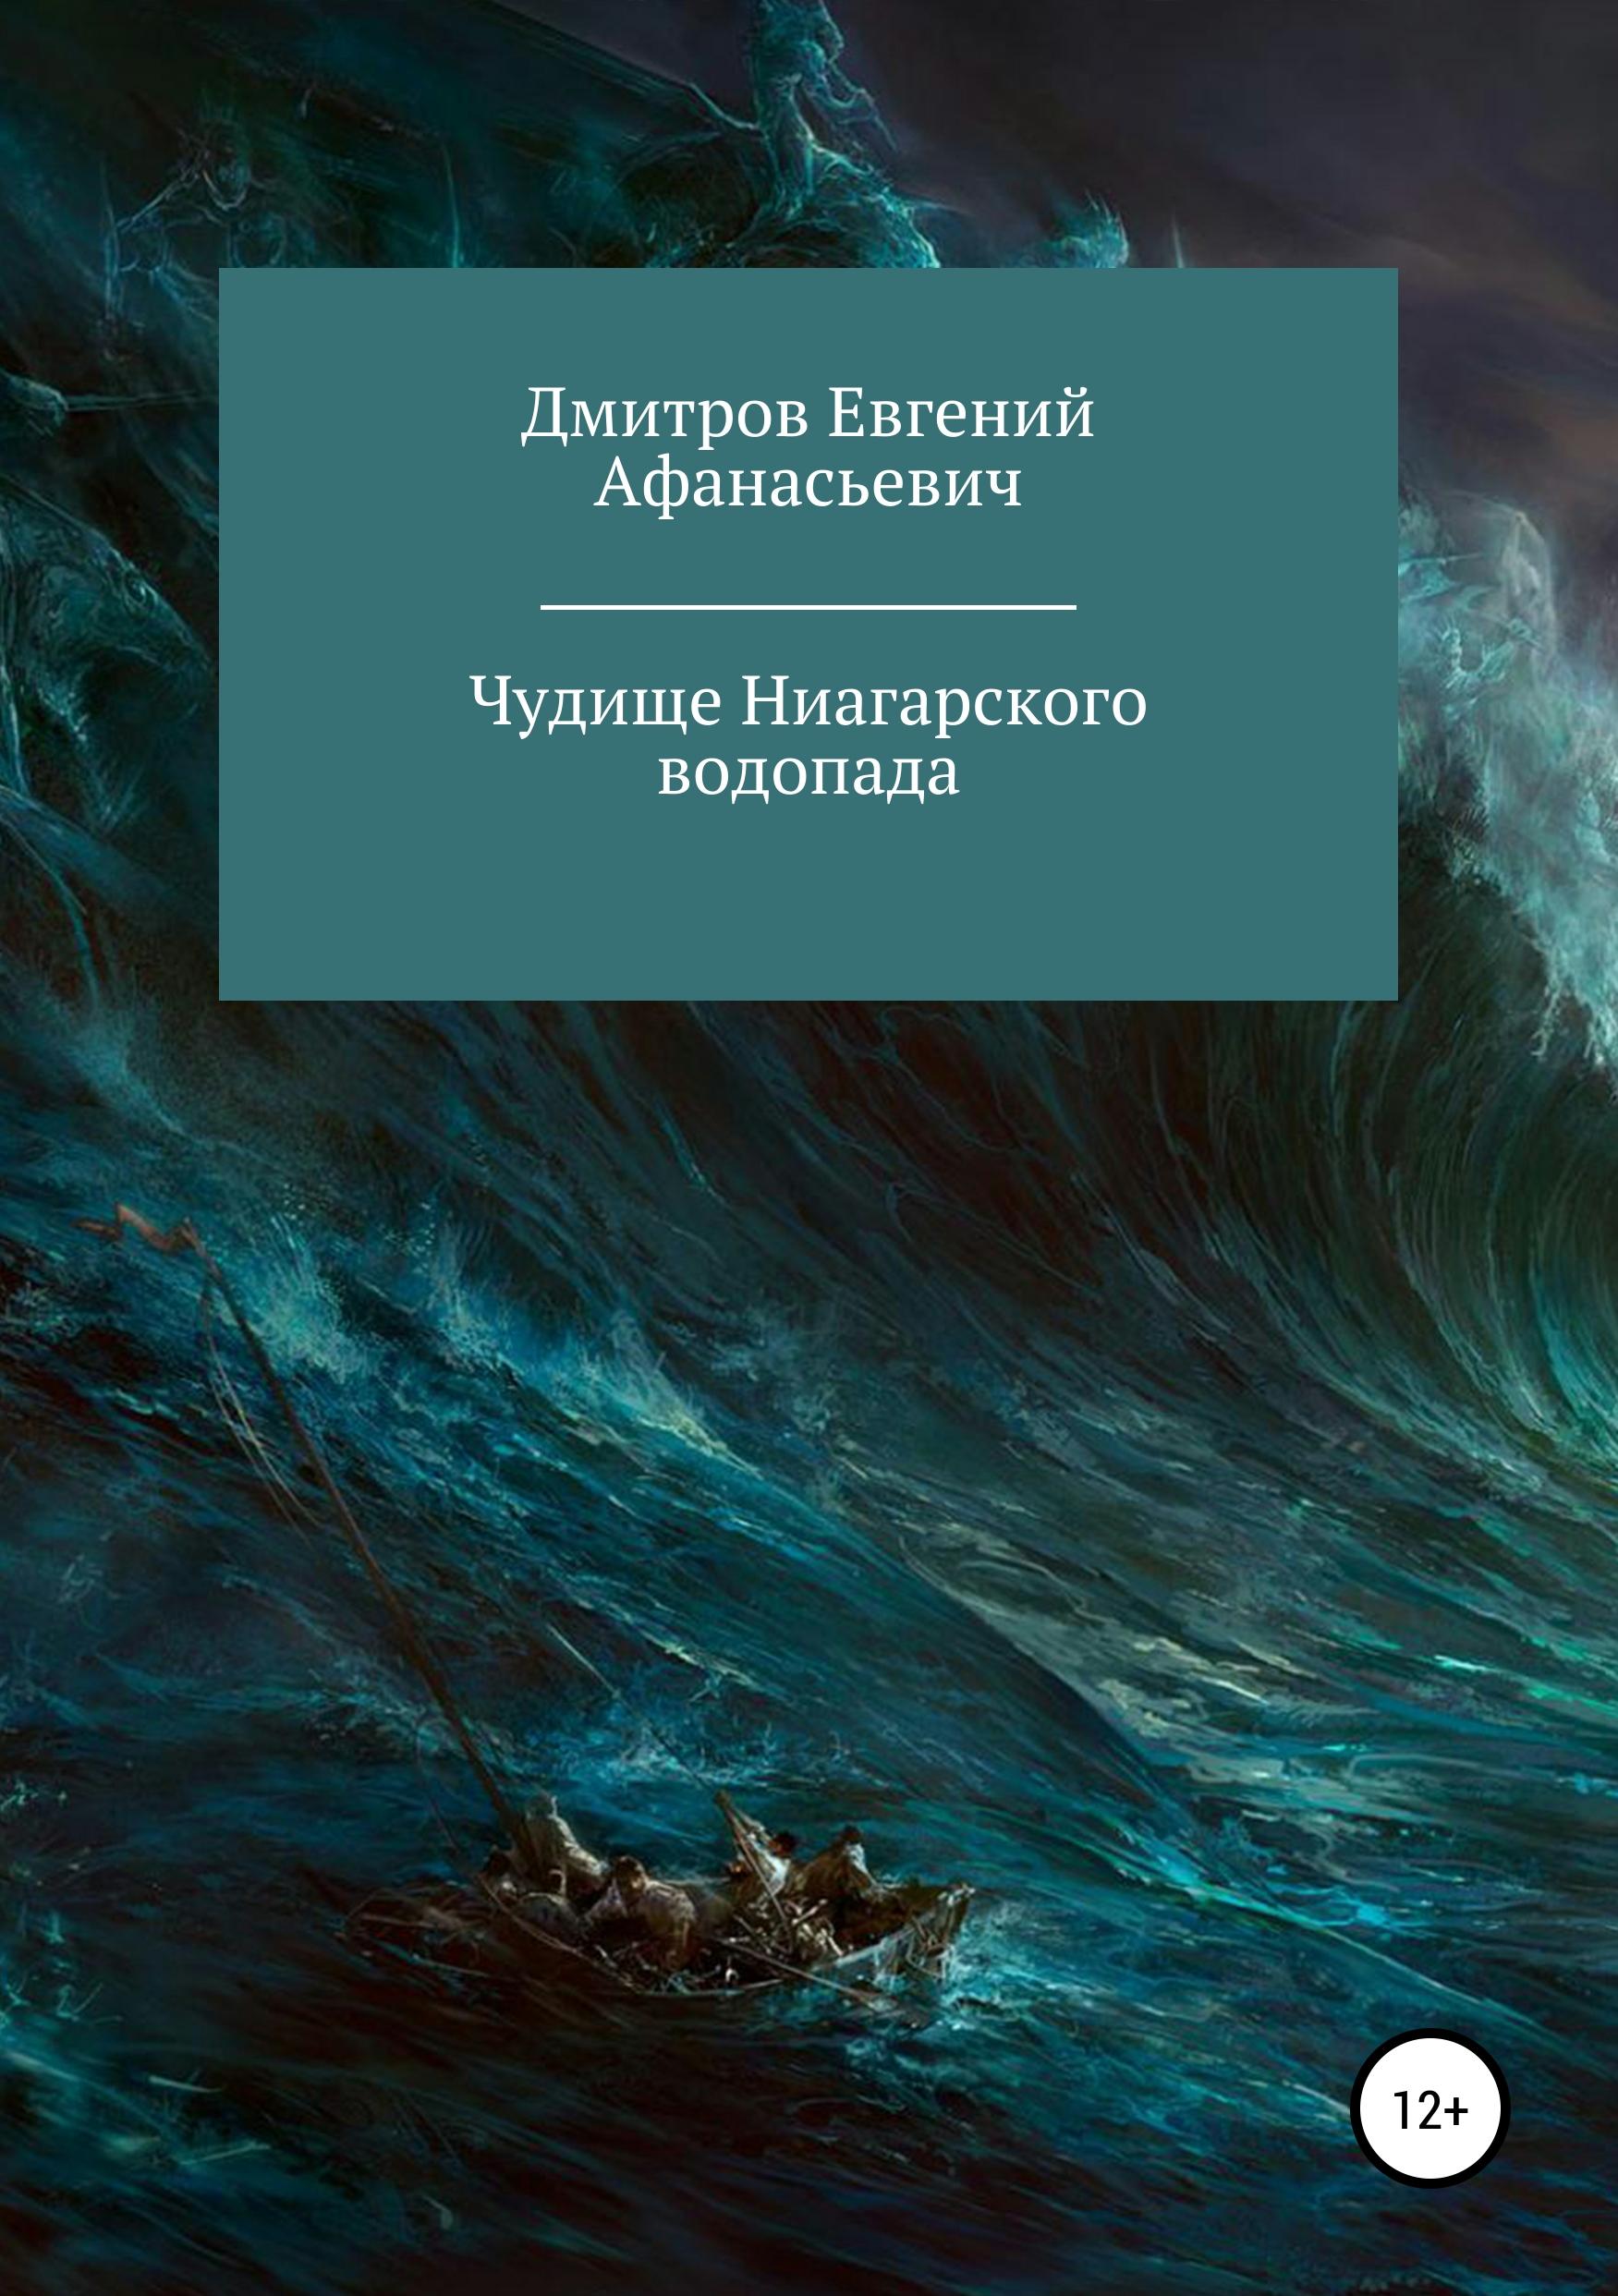 Евгений Афанасьевич Дмитров Чудище Ниагарского водопада